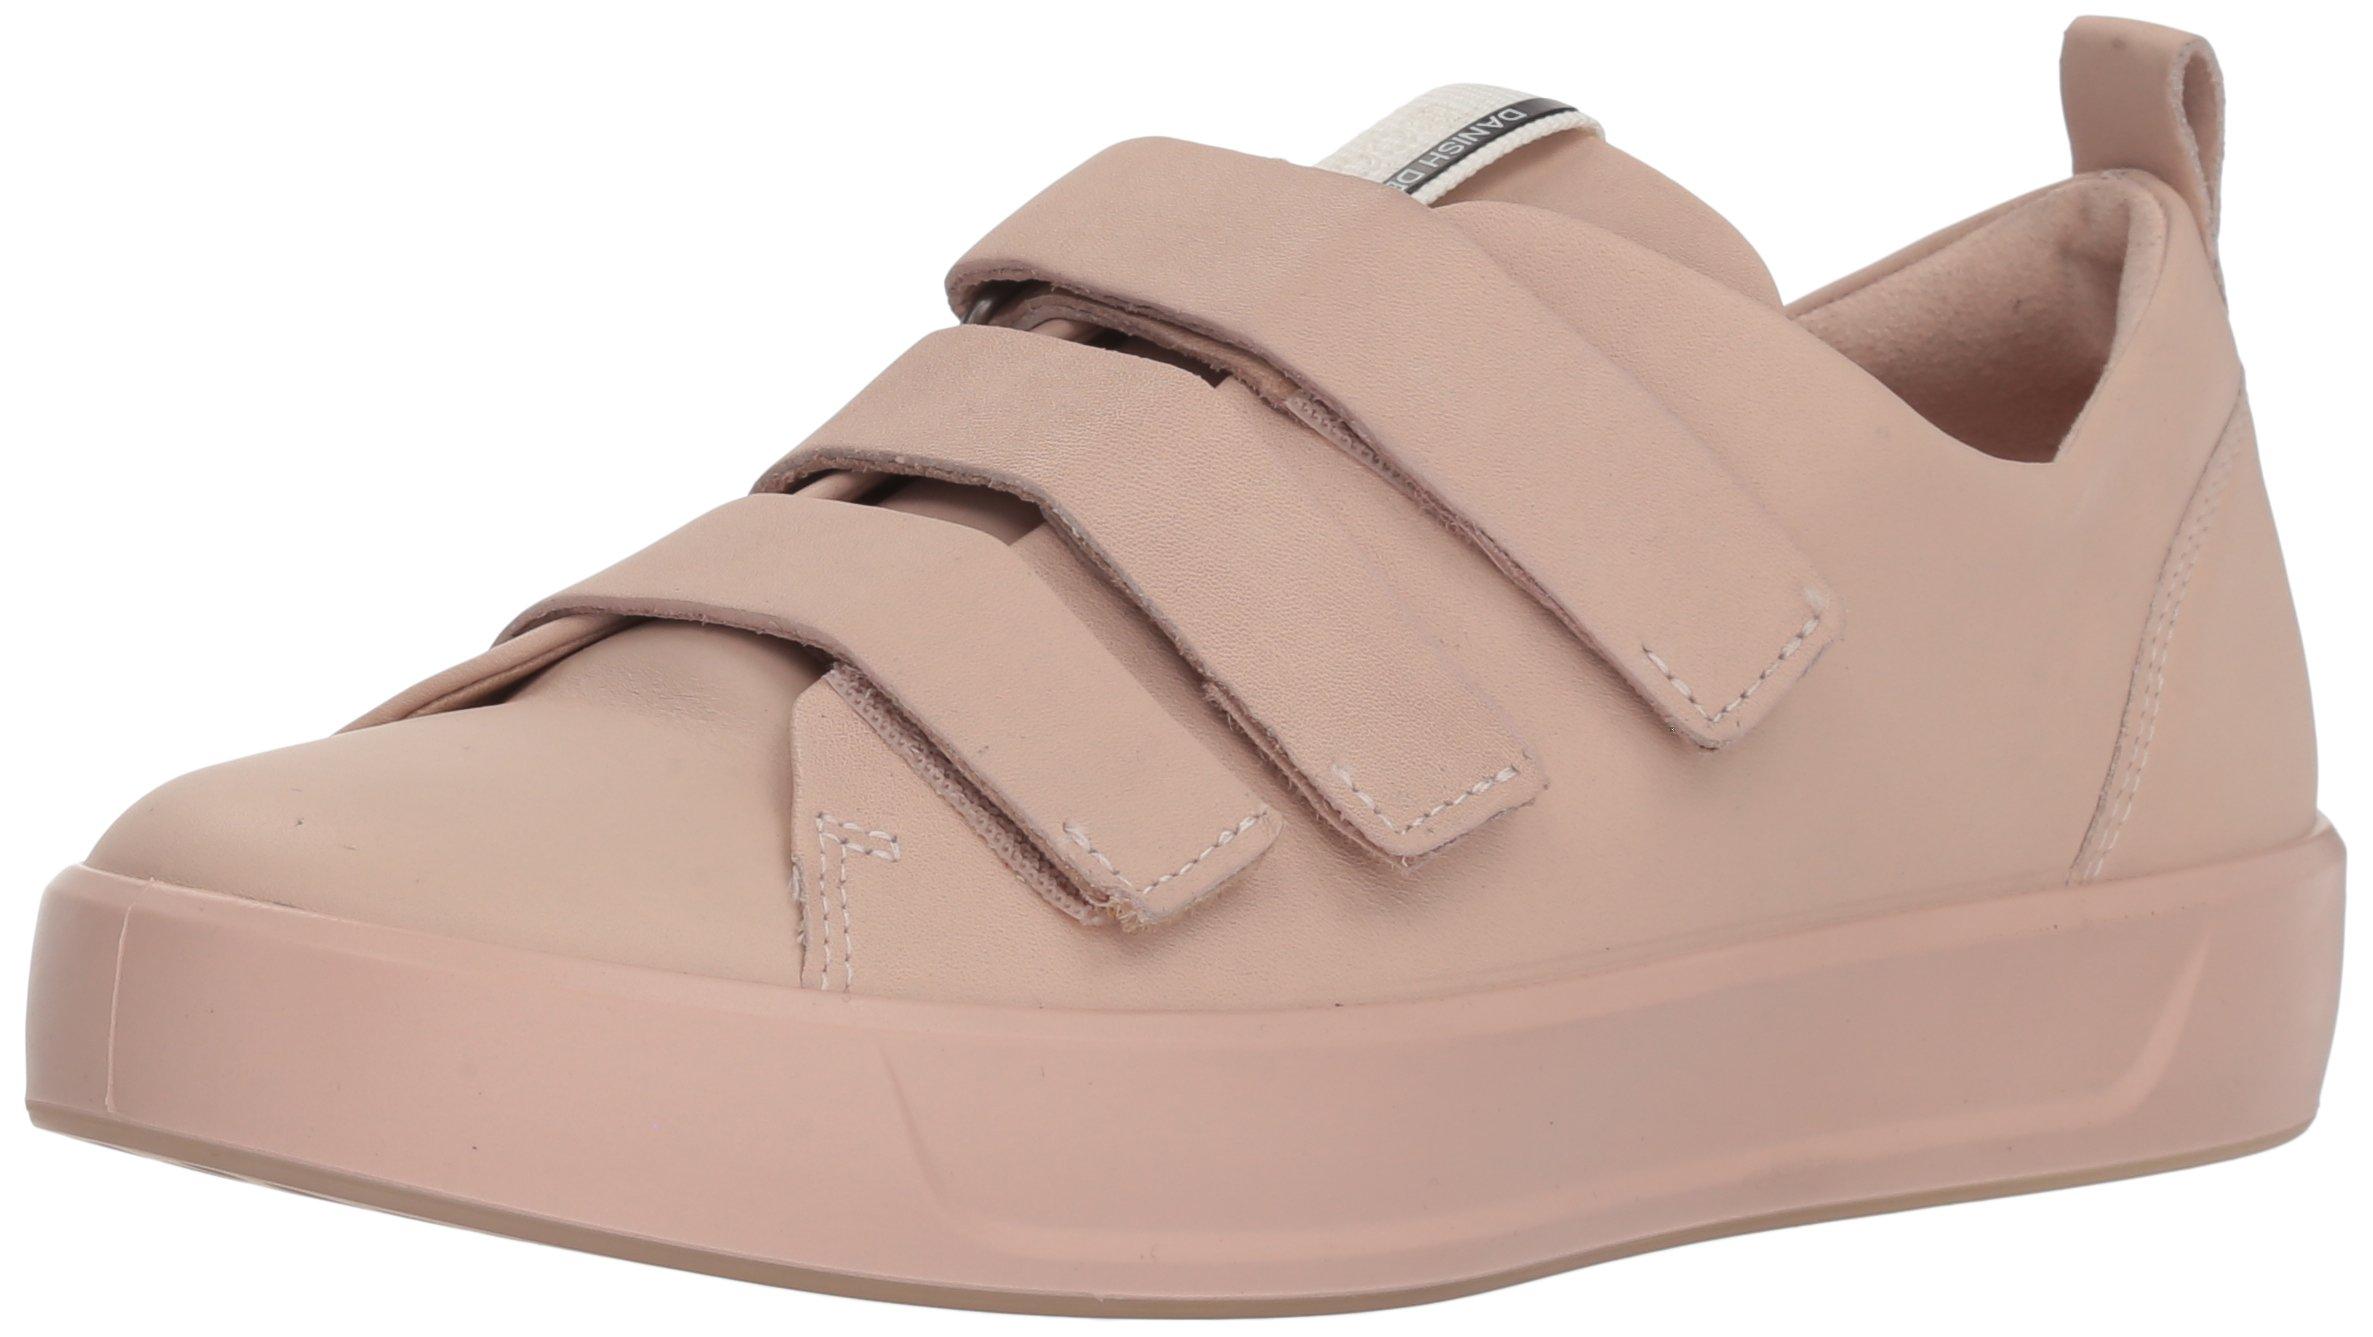 8Sneakers Femmerose Dust40 Basses Ecco Eu Soft 1F3TJlKc